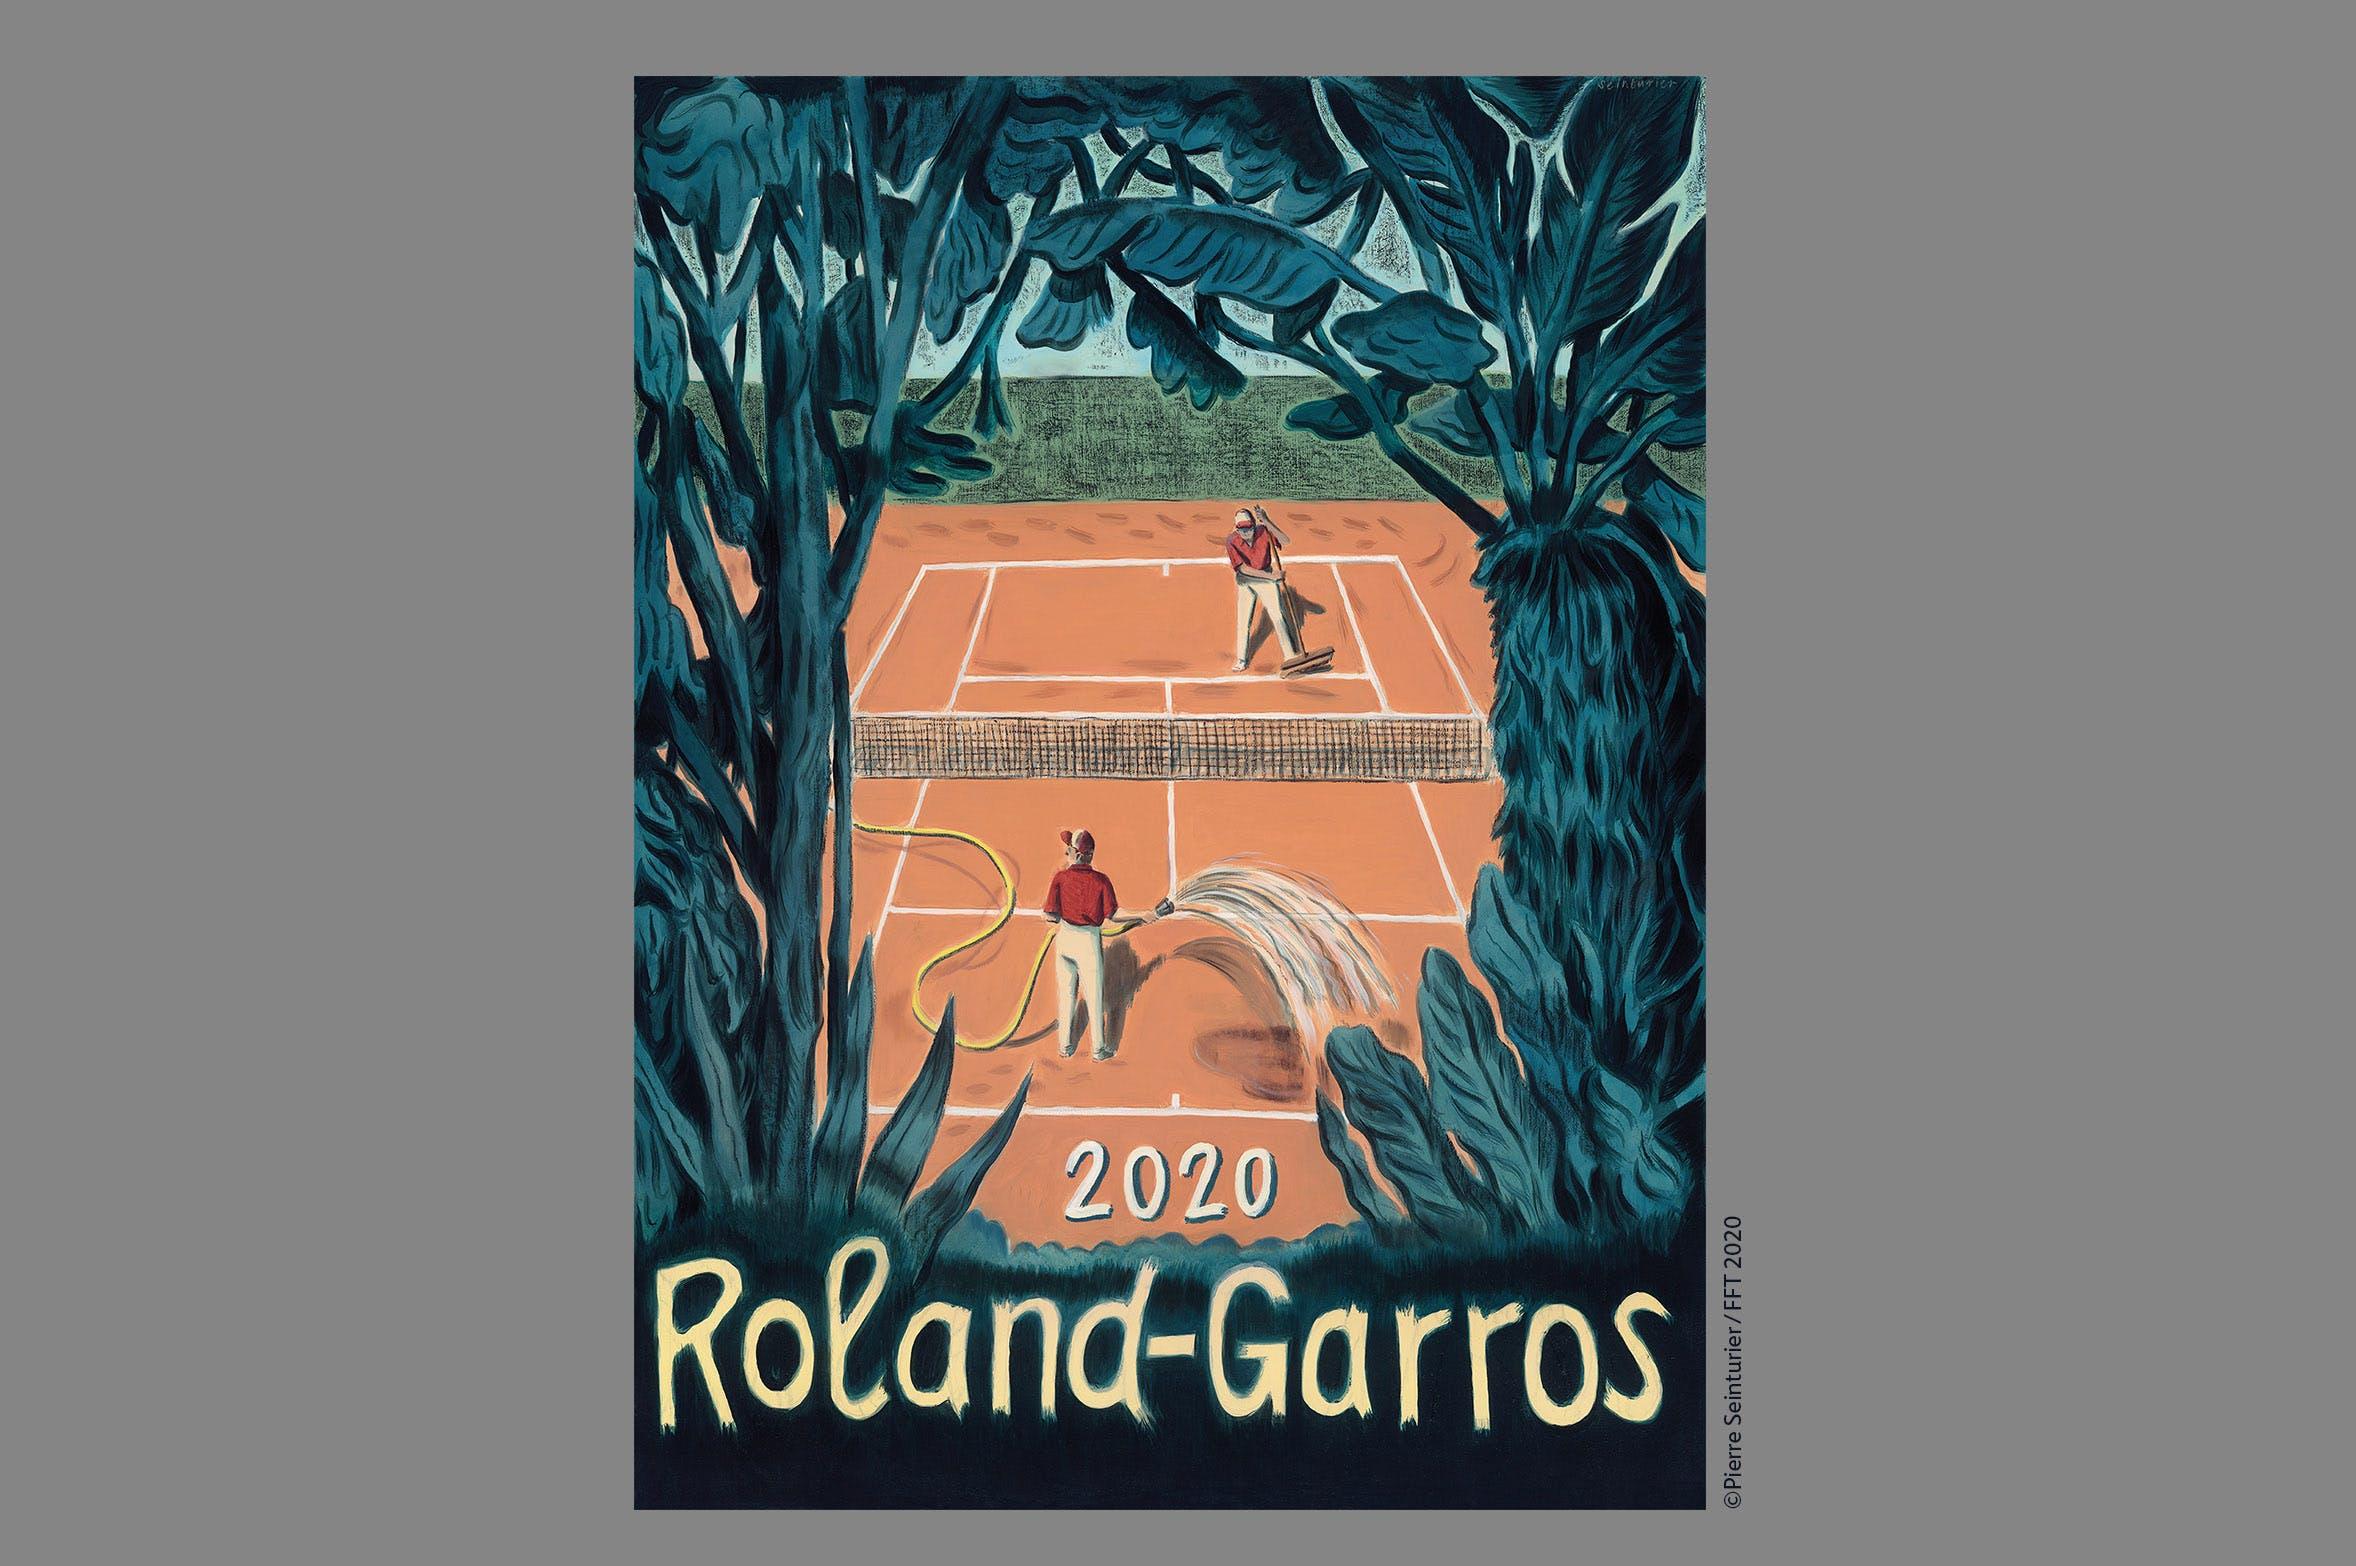 Roland-Garros 2020 poster